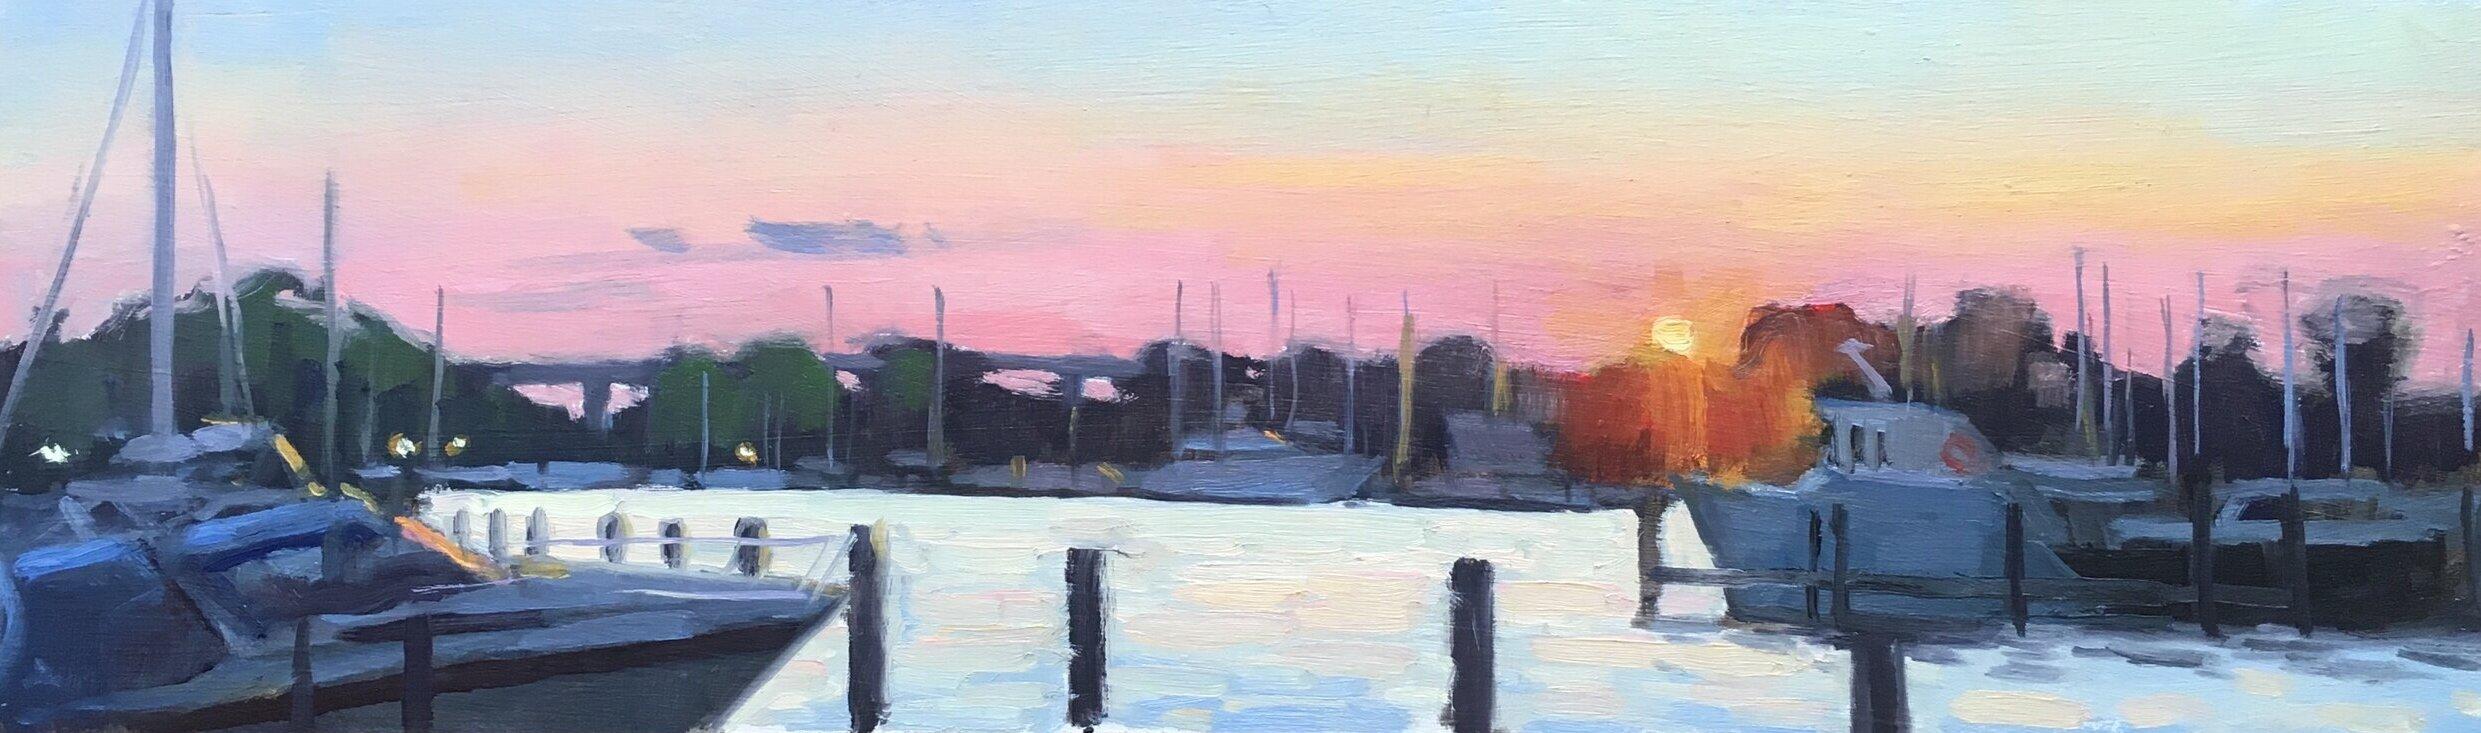 L Dock Sunset 2